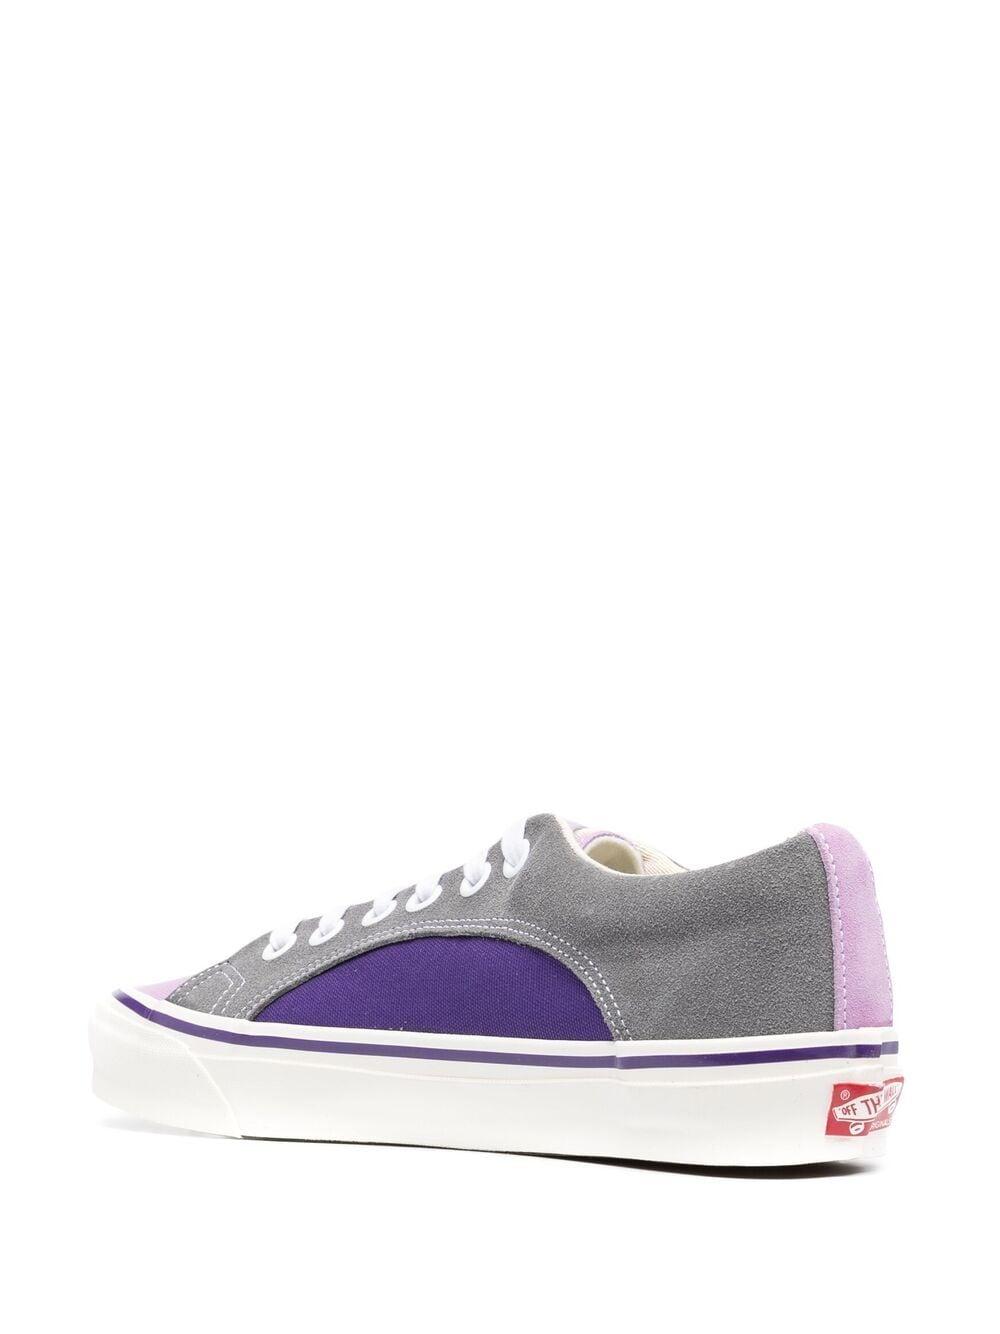 Vans Vault og lampin lx ua sneakers unisex multicolor VANS VAULT | Sneakers | VN0A45J64NB1